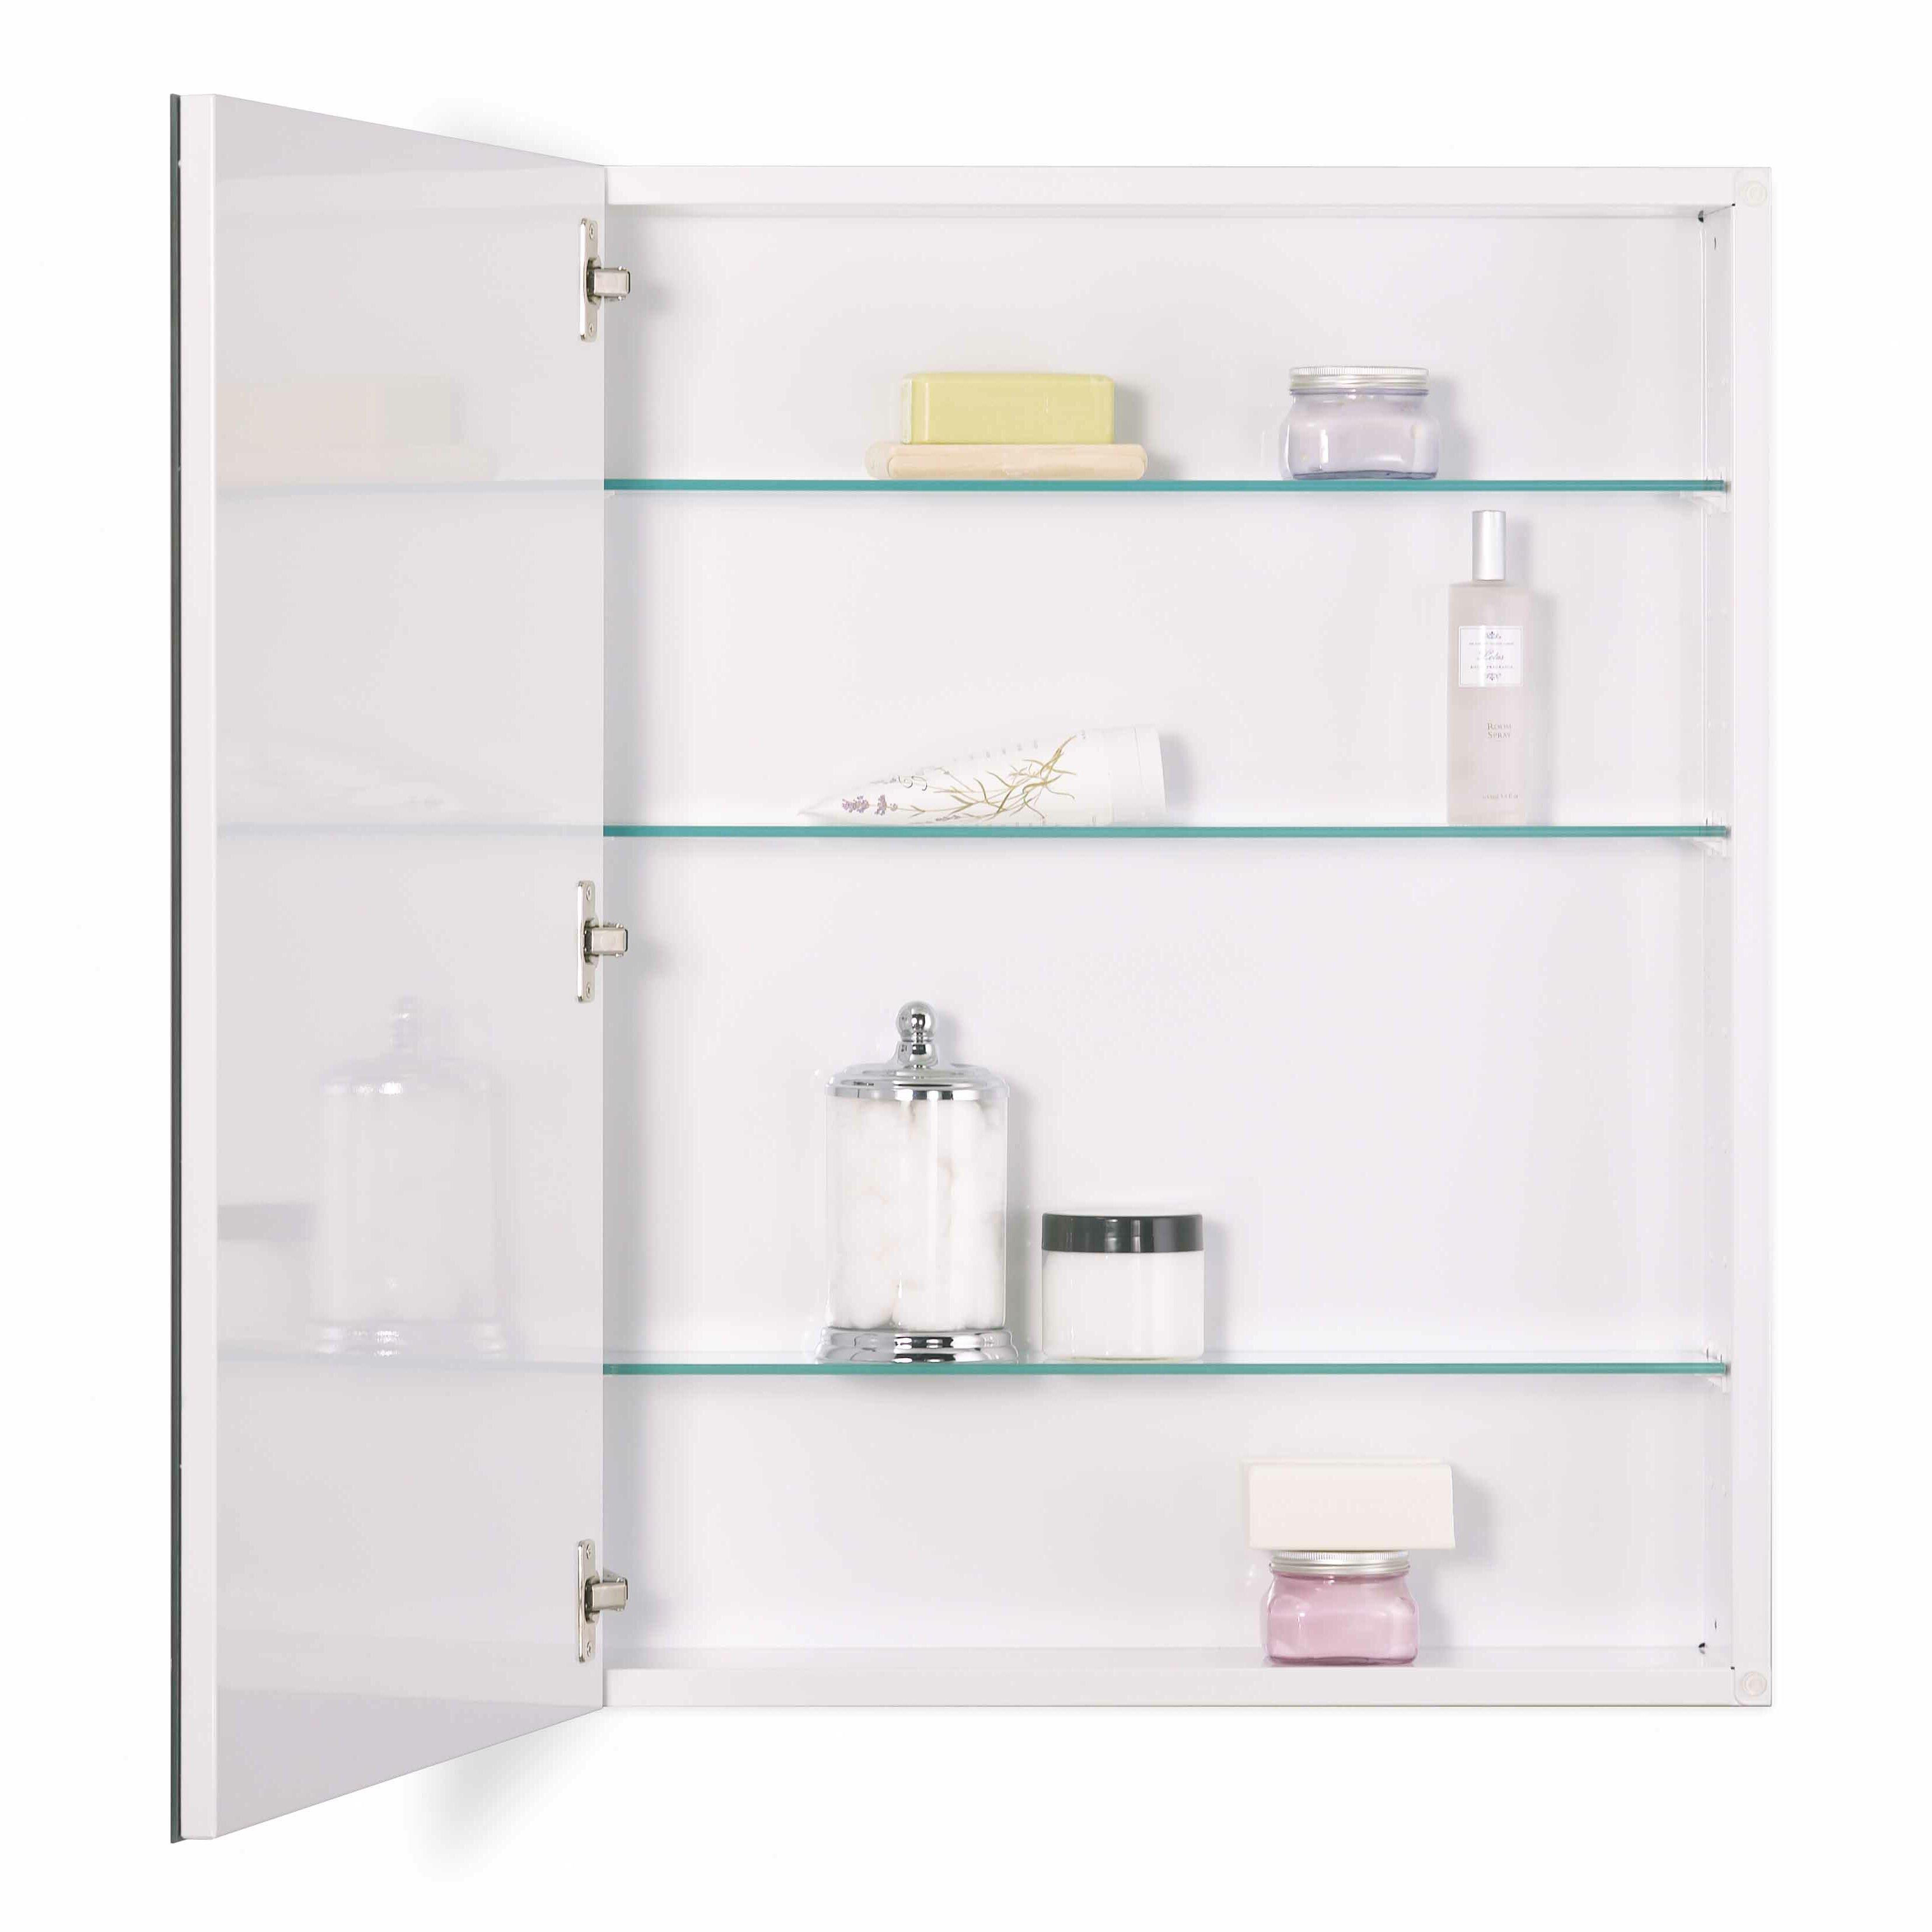 30 X 30 Medicine Cabinet Jensen 24 X 30 Recessed Or Surface Mount Medicine Cabinet